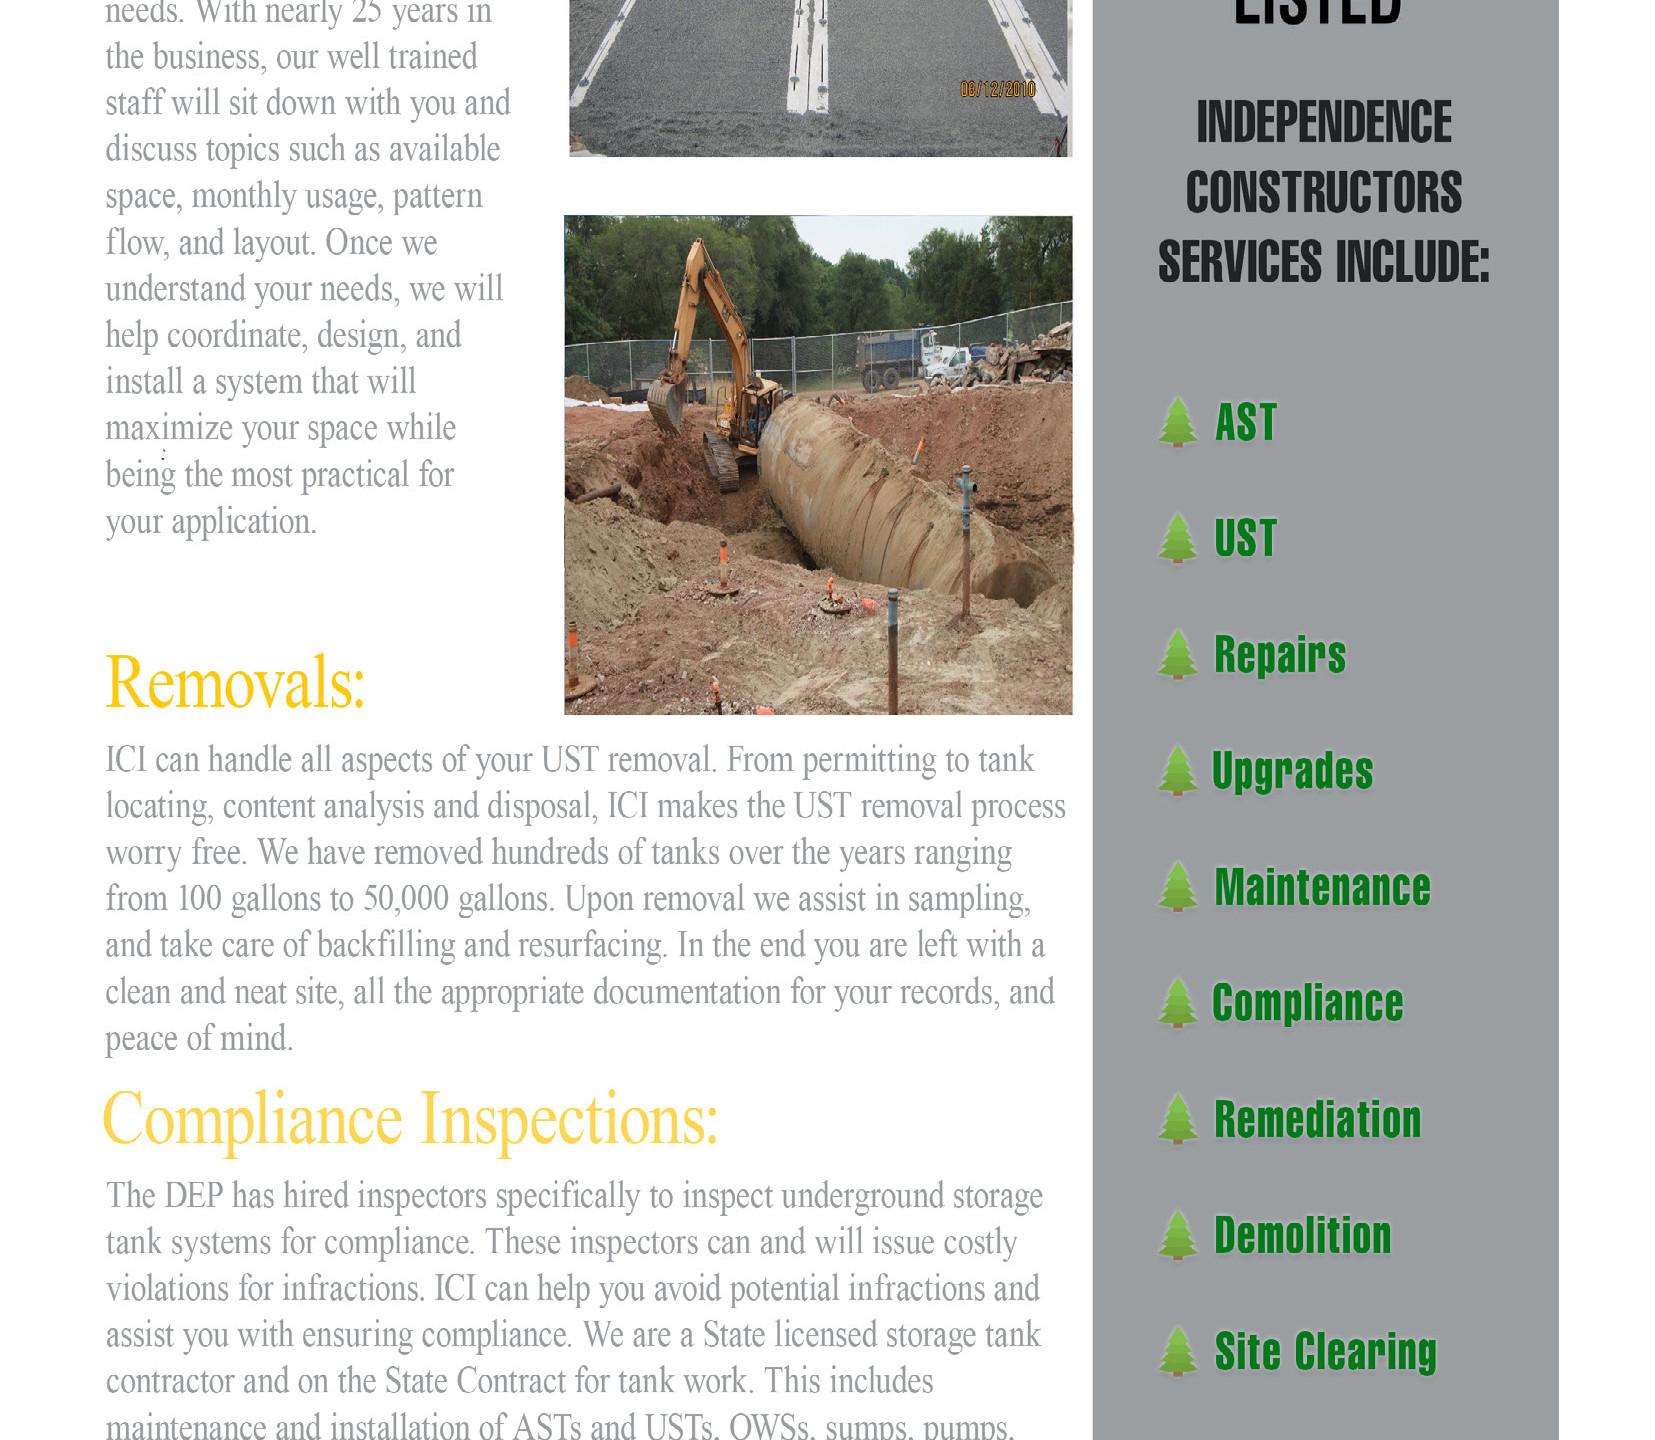 Independence Constructors - Newsletter -